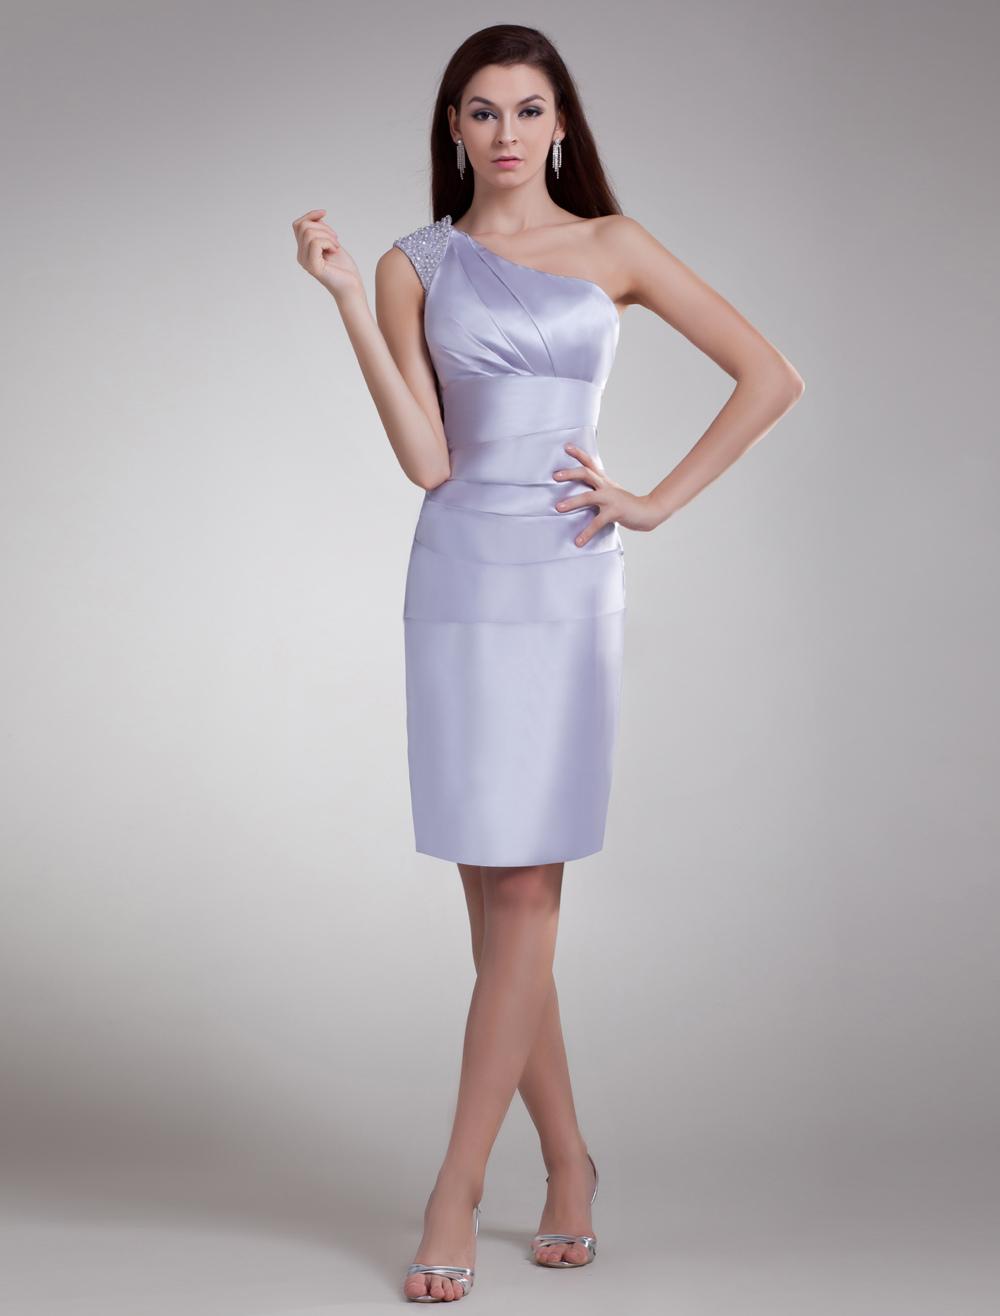 One-Shoulder Short Cocktail Dress (Wedding Bridesmaid Dresses) photo